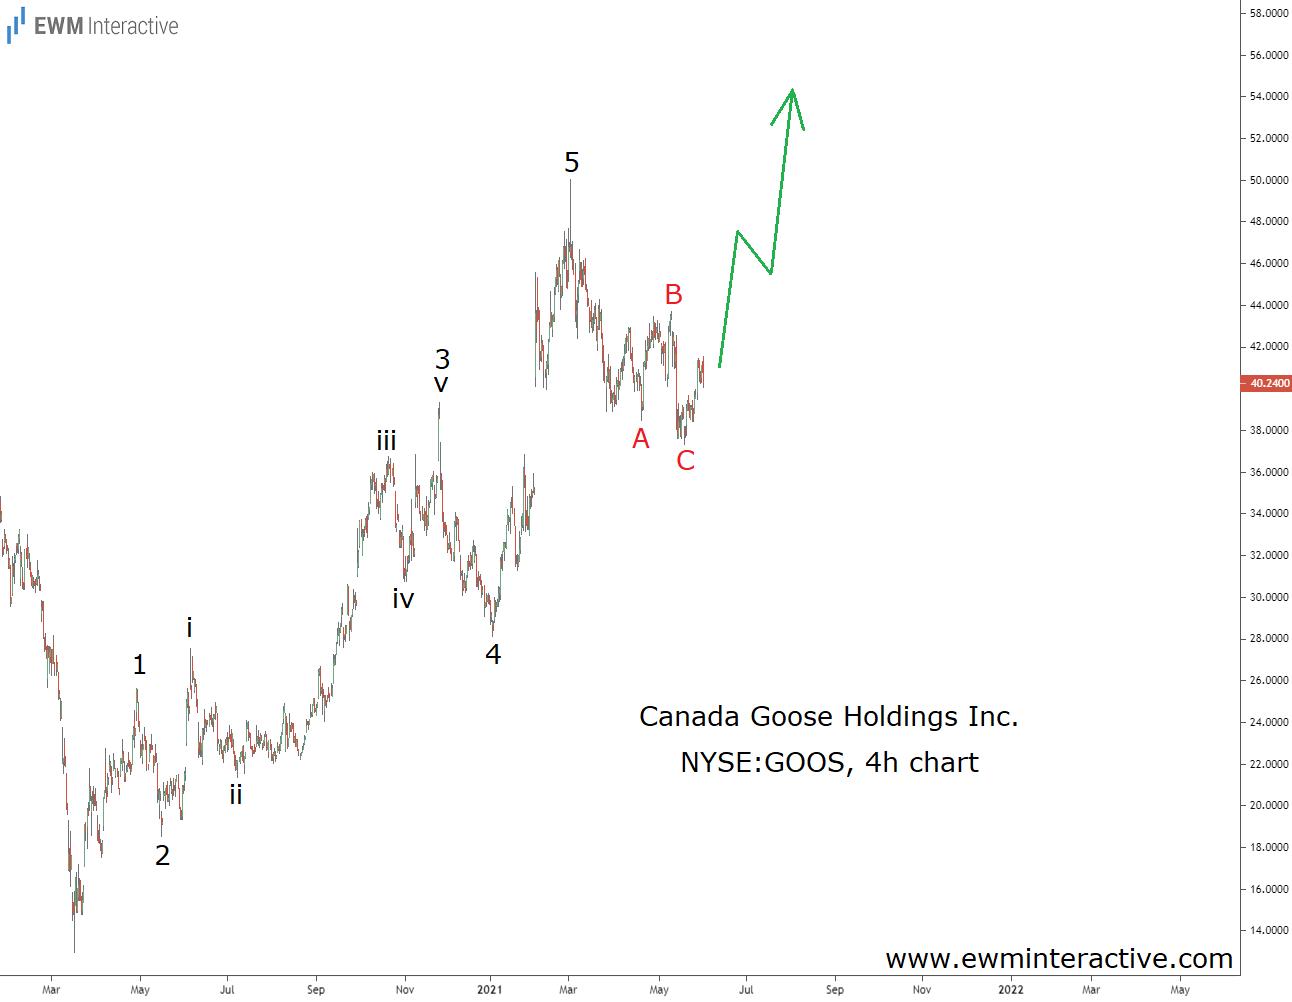 Canada Goose draws bullish impulse pattern